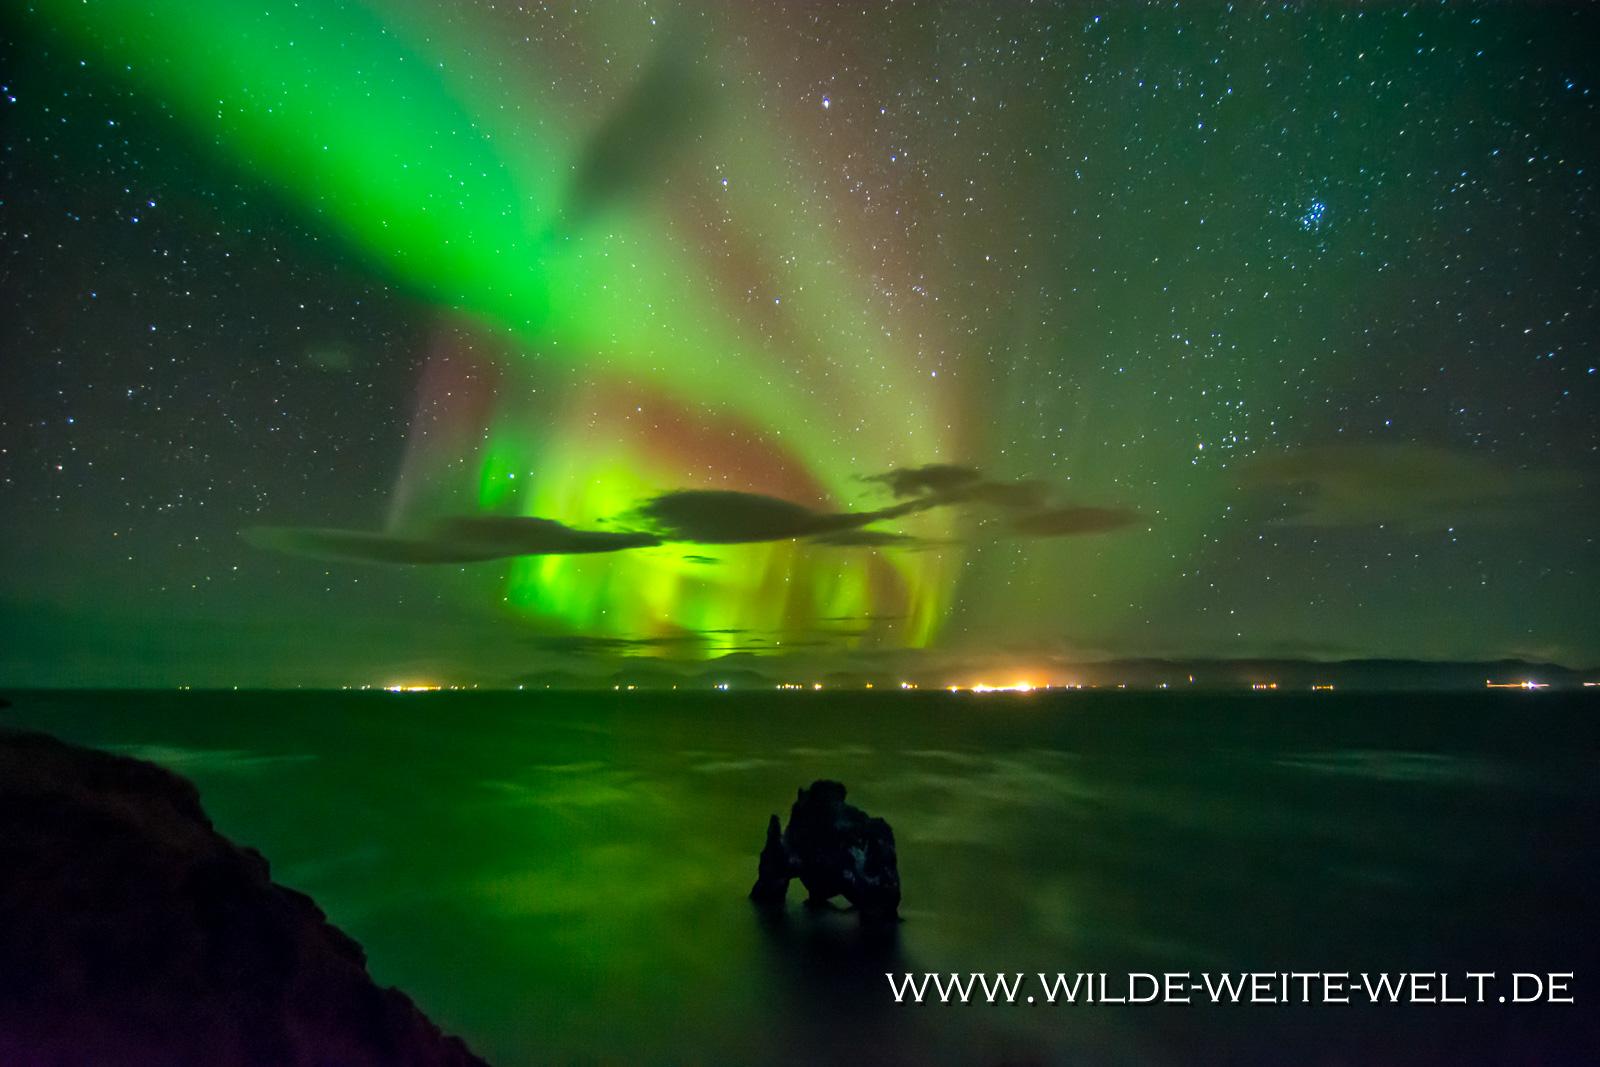 Aurora-Borealis-Jökulsarlon-1-Island-149-1024x683 Iceland's Aurora Borealis - Northern Lights on Iceland - Nordlichter Island